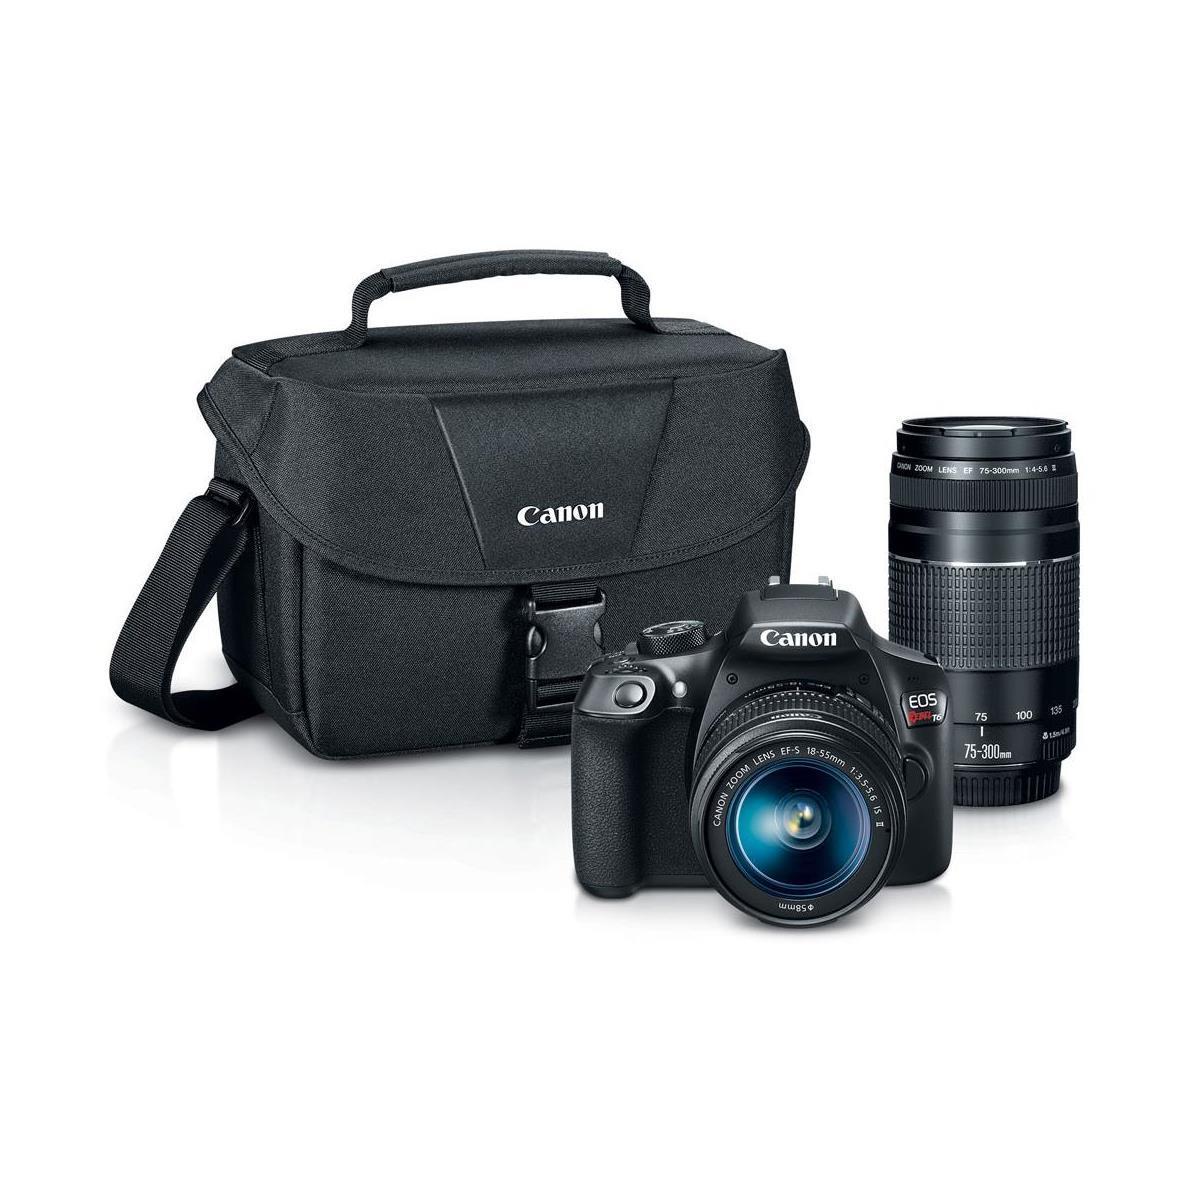 Canon EOS Rebel T6 DSLR 2 Lens Camera Kit with Promo Printer Bundle-$350